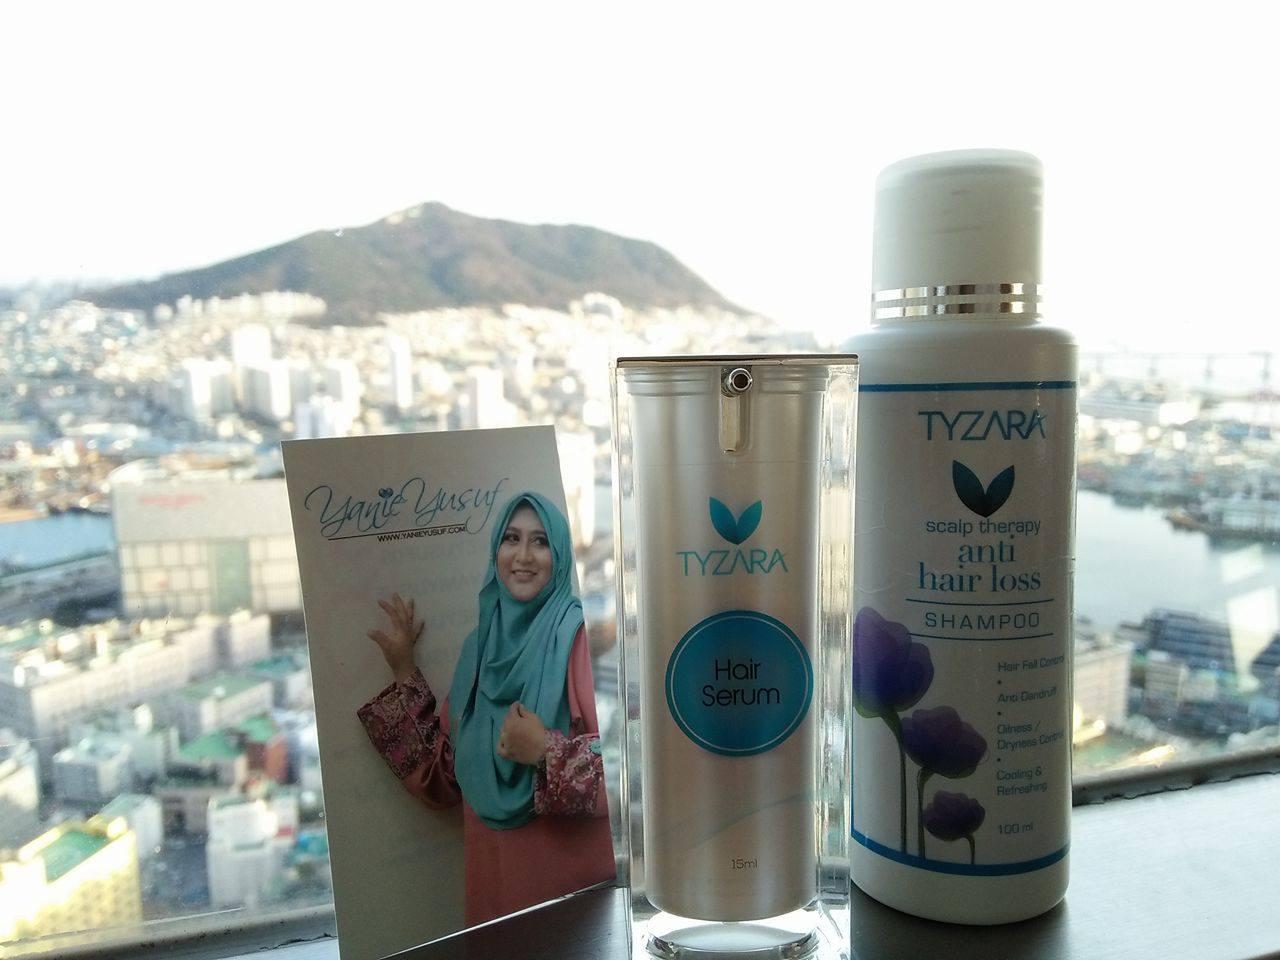 Kenapa aku pilih TYZARA sebagai shampoo Travel?